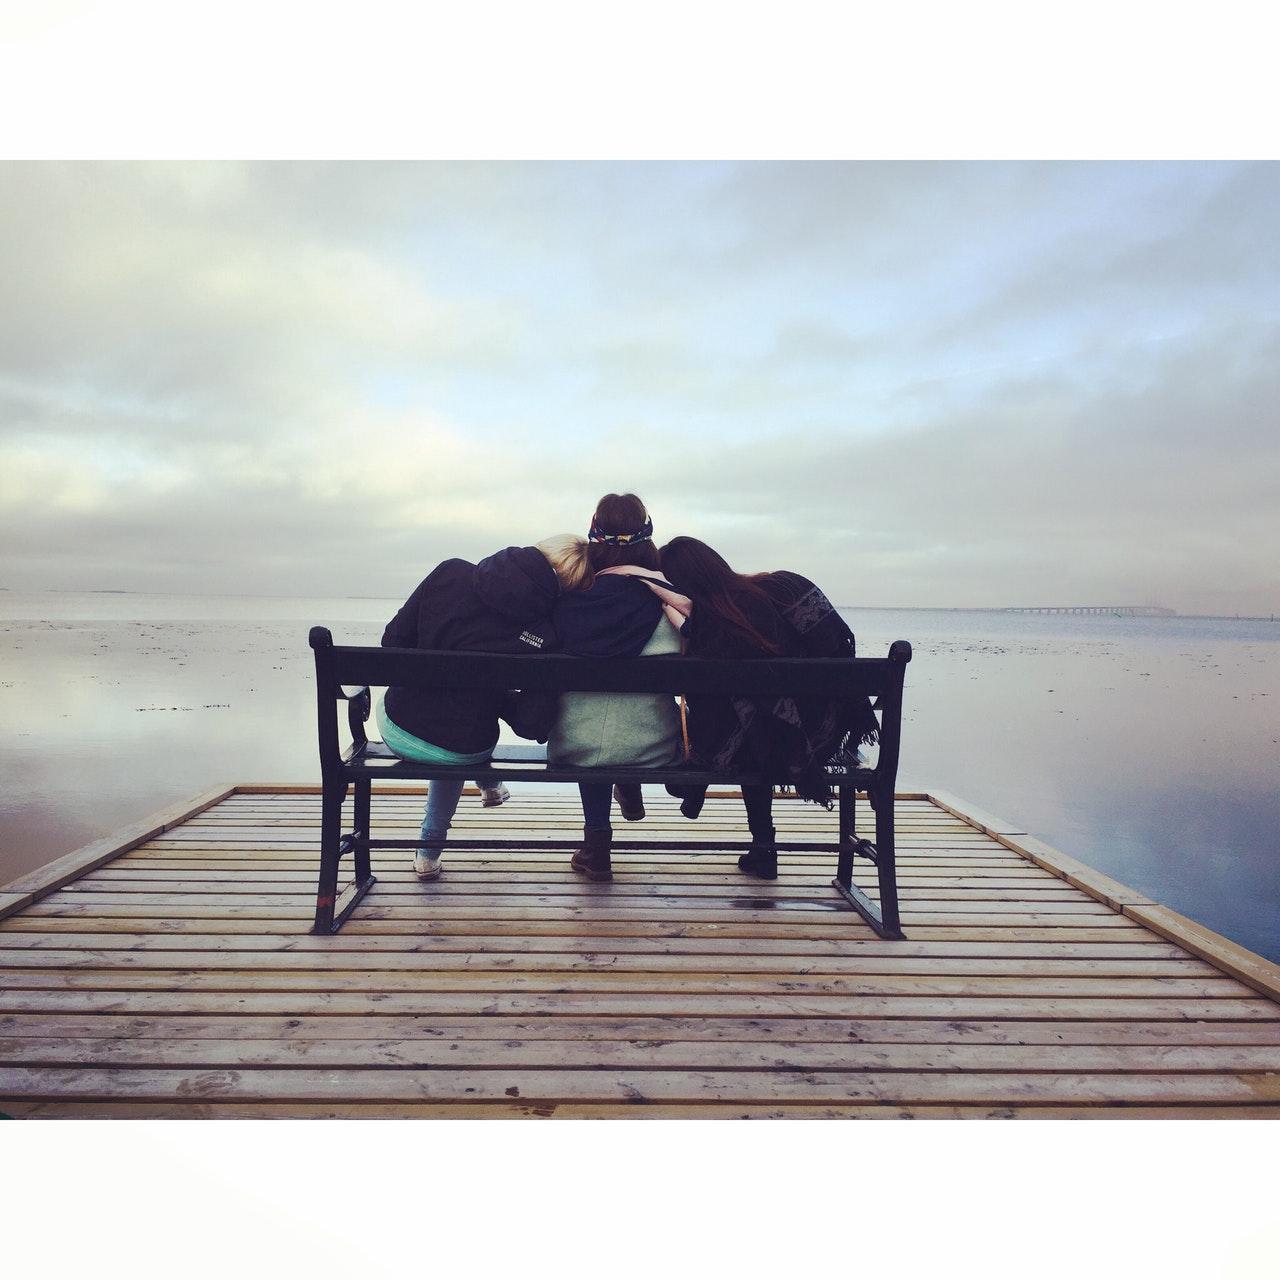 friends-tatiana-vavrikova-pexels